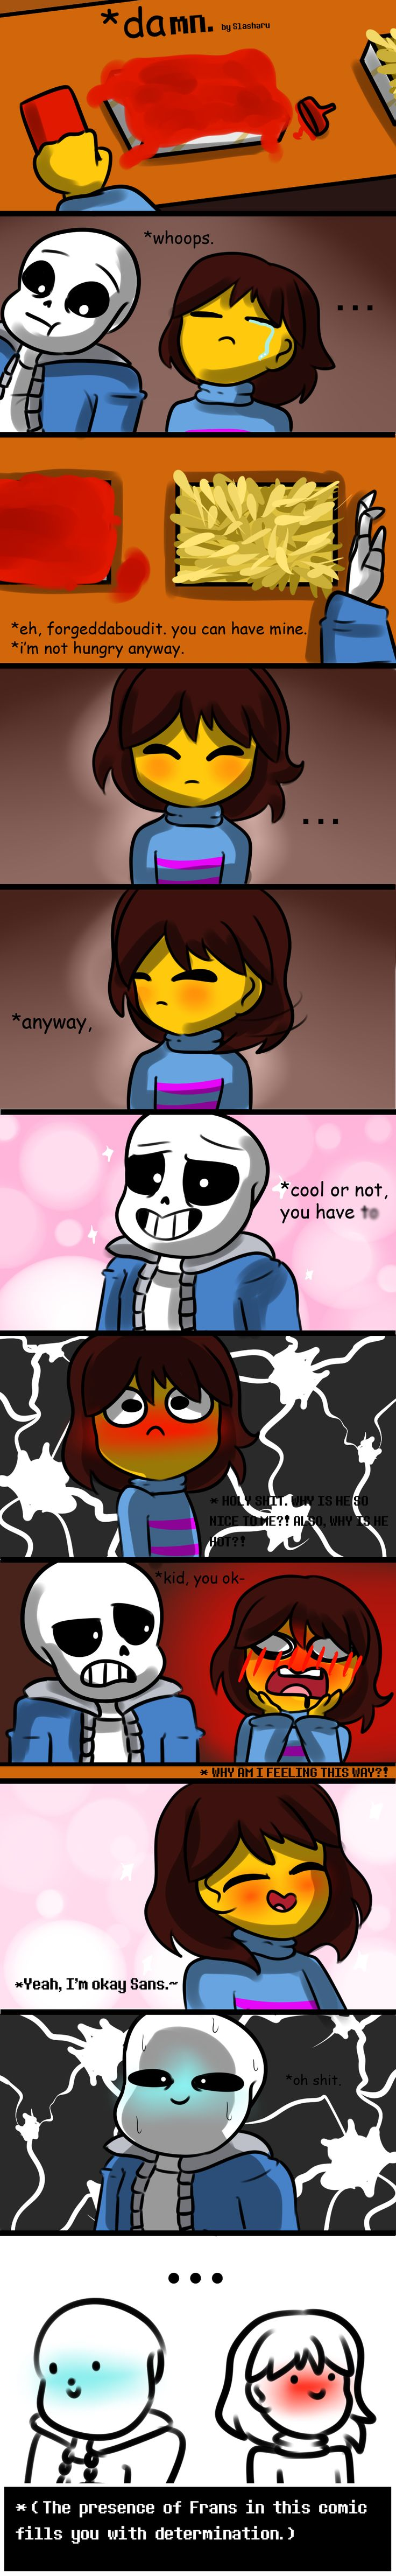 Comic: damn. by Slasharu on DeviantArt